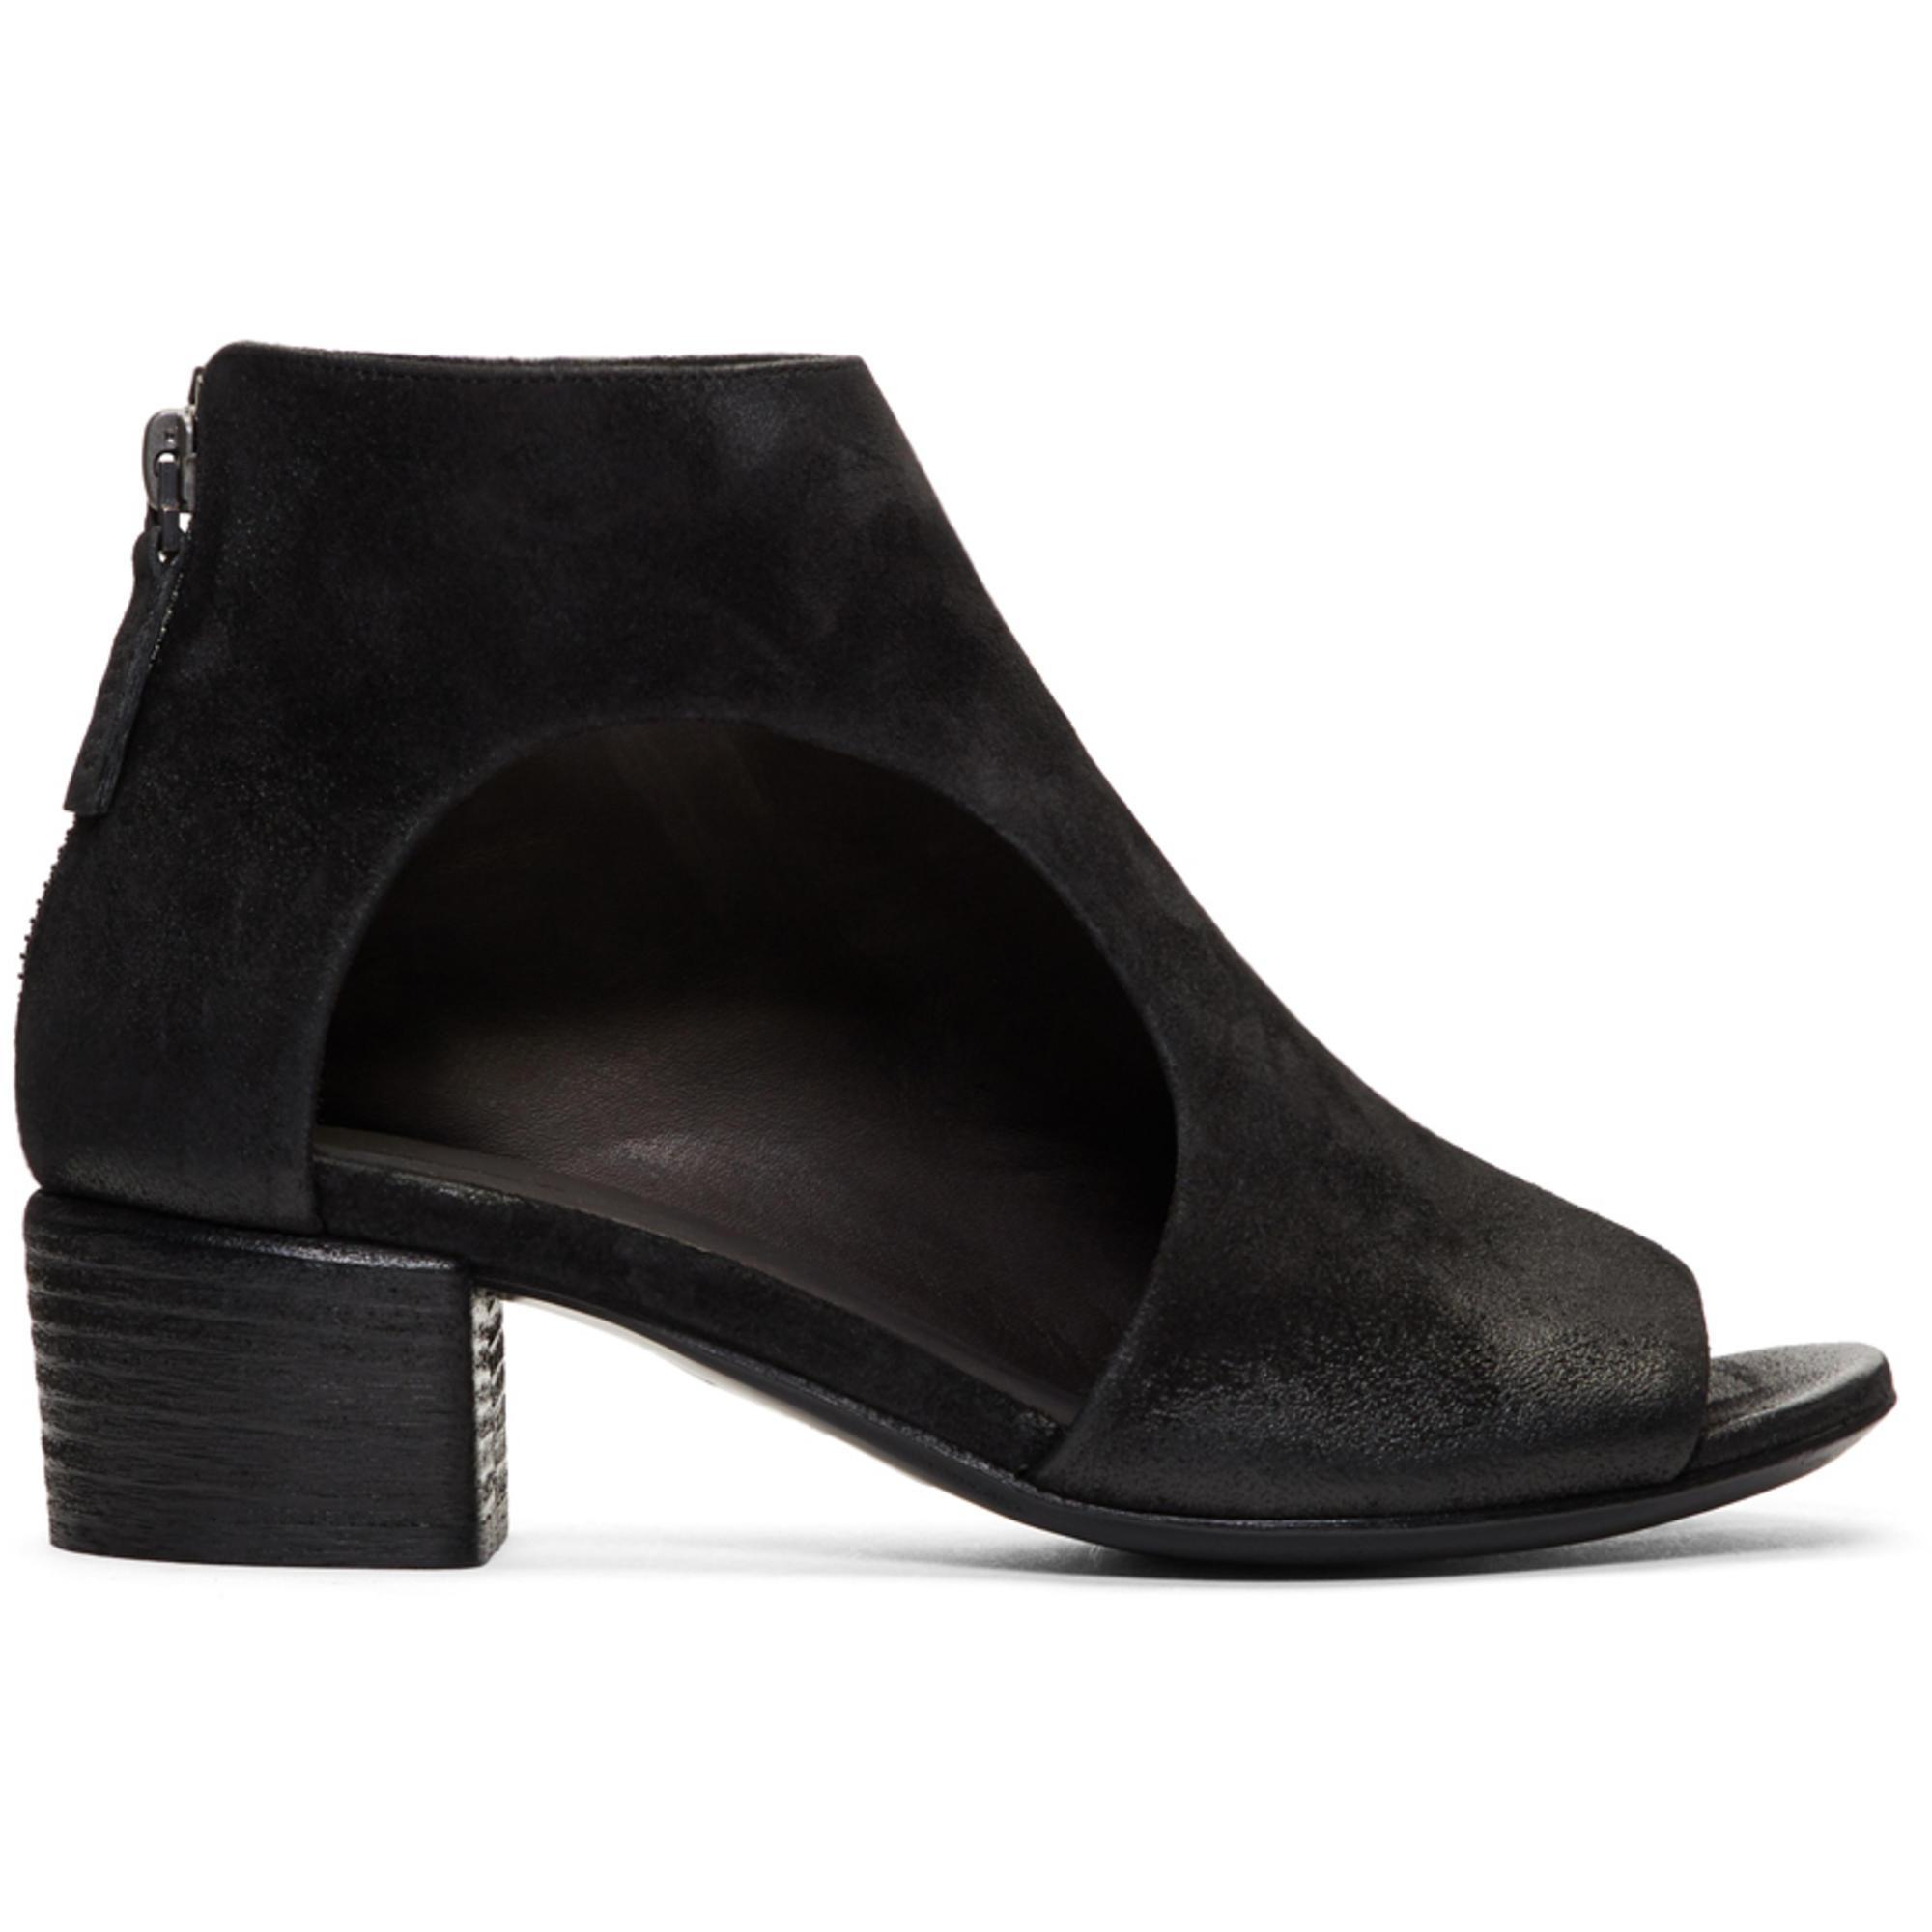 White Bo Sandalo Boots Mars��ll rtHBgJCP